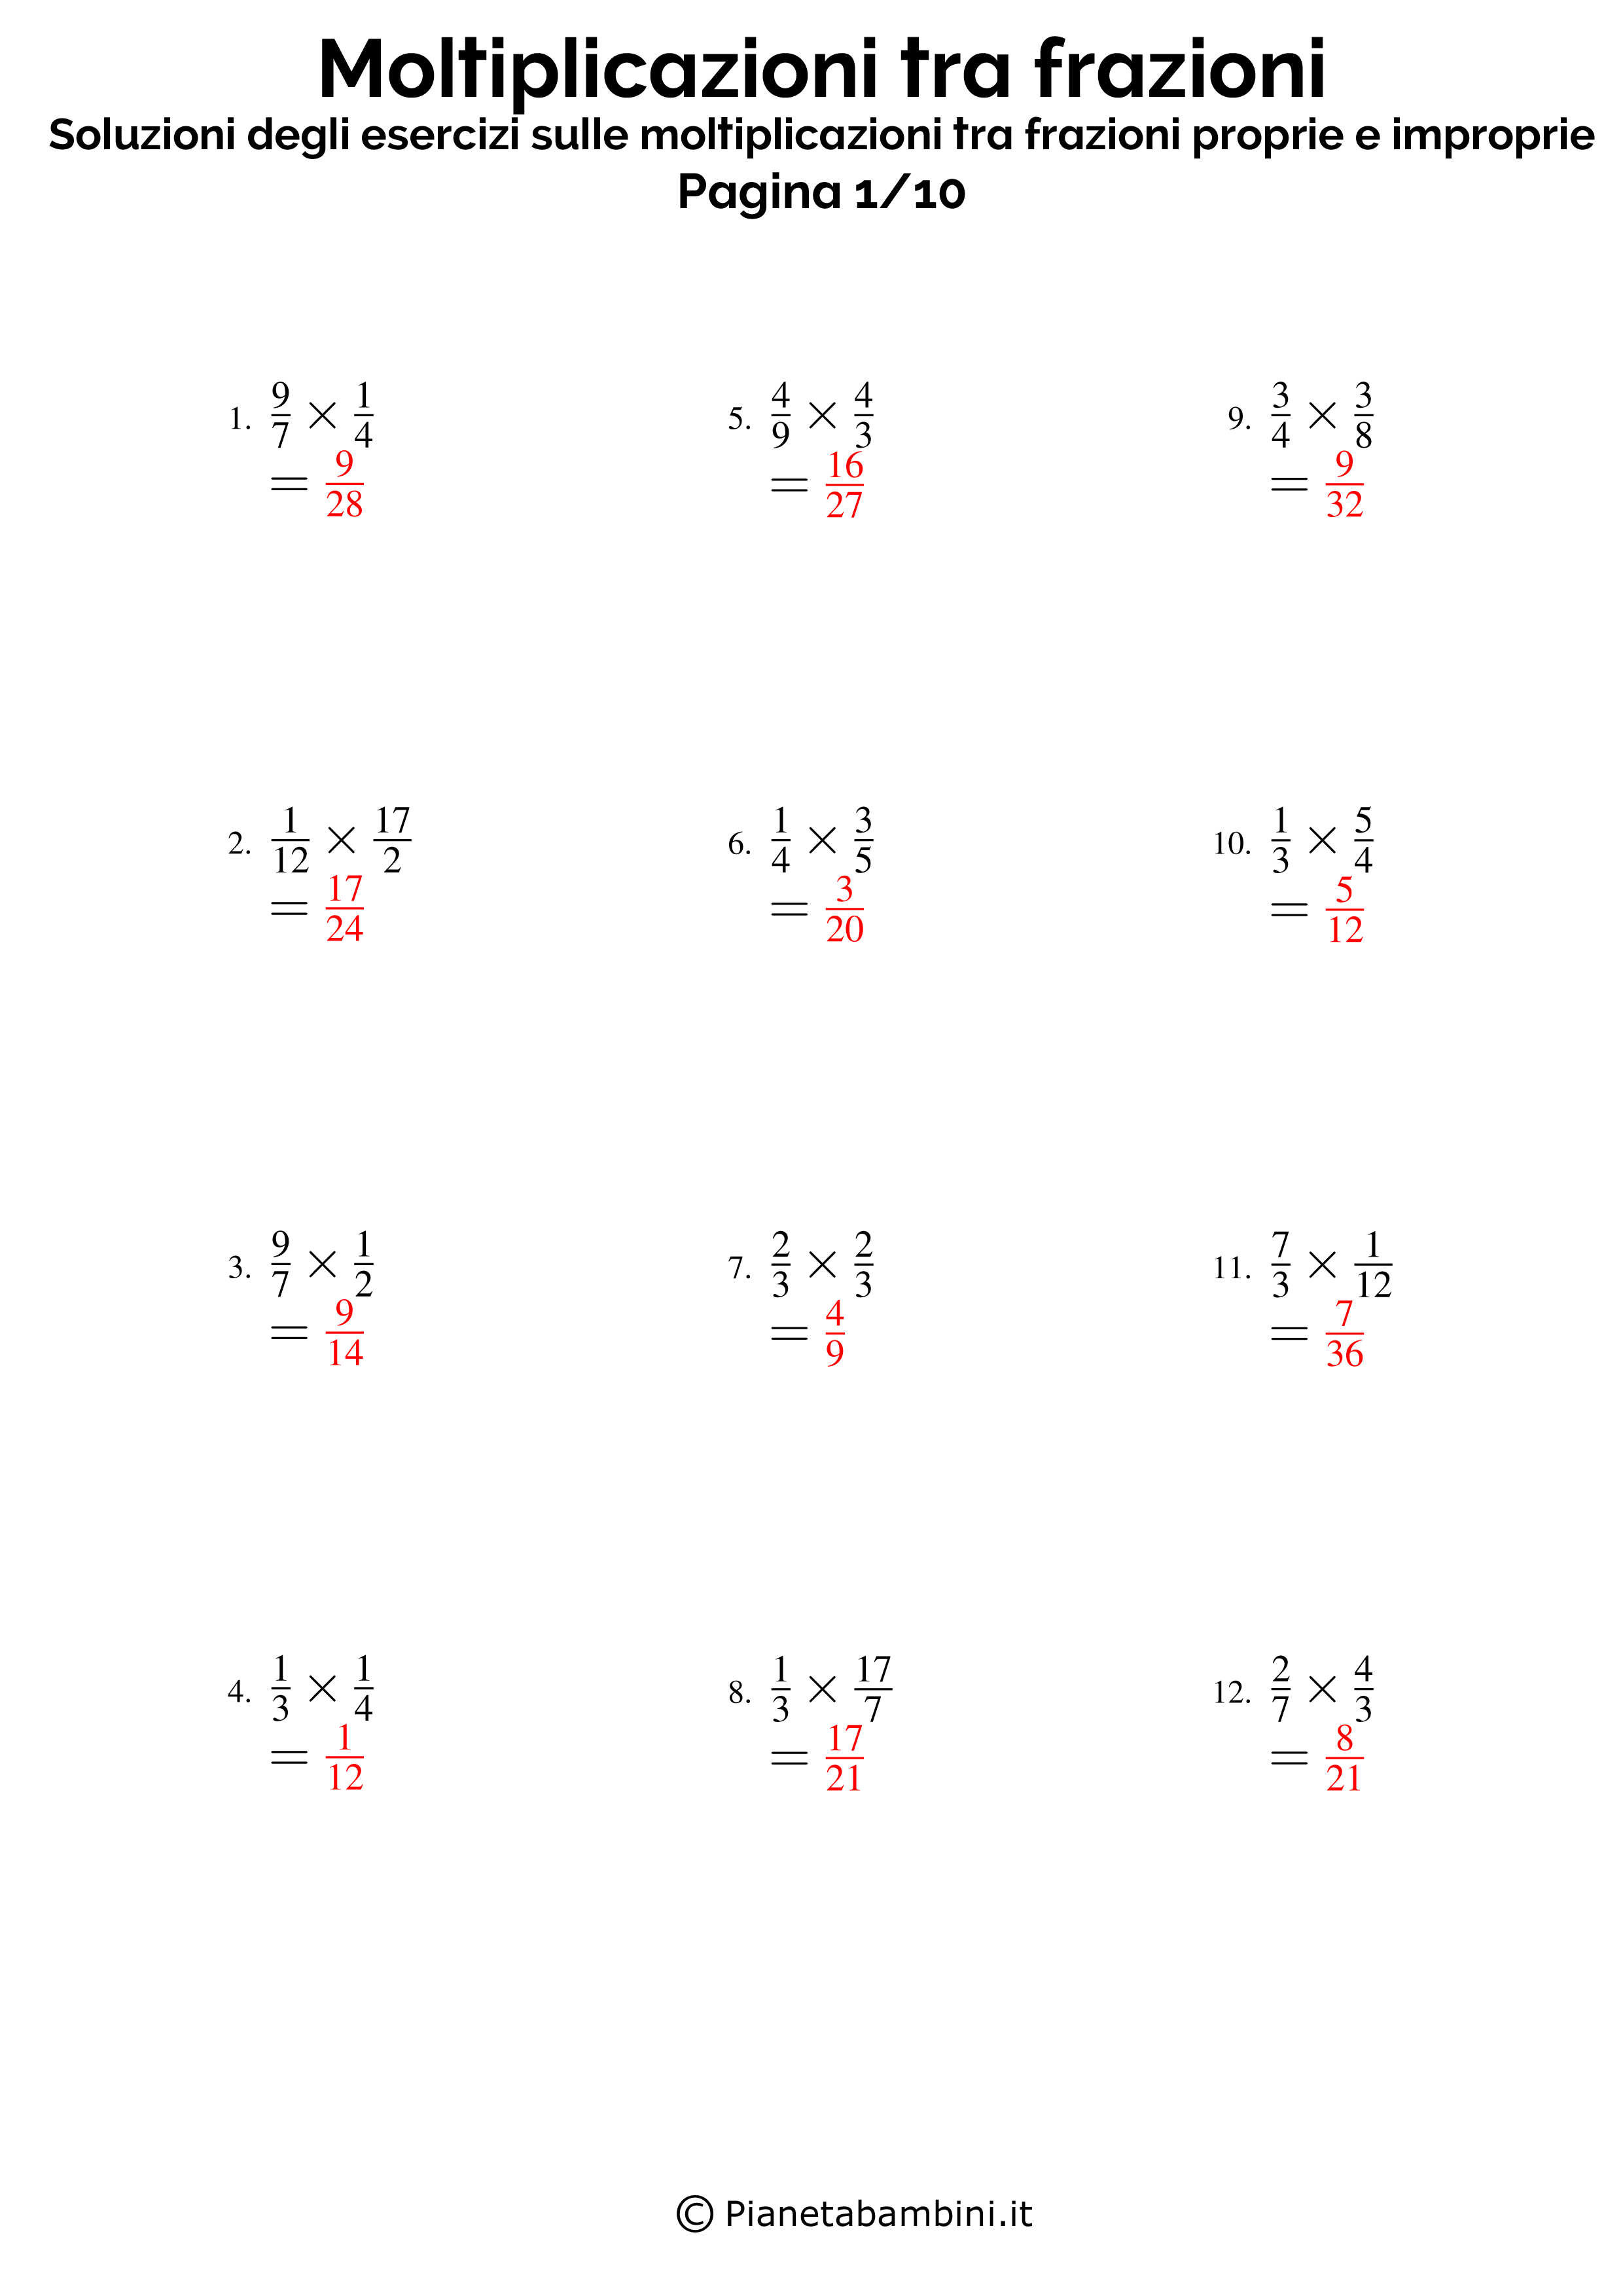 Soluzioni-Moltiplicazioni-Frazioni-Proprie-Improprie_01